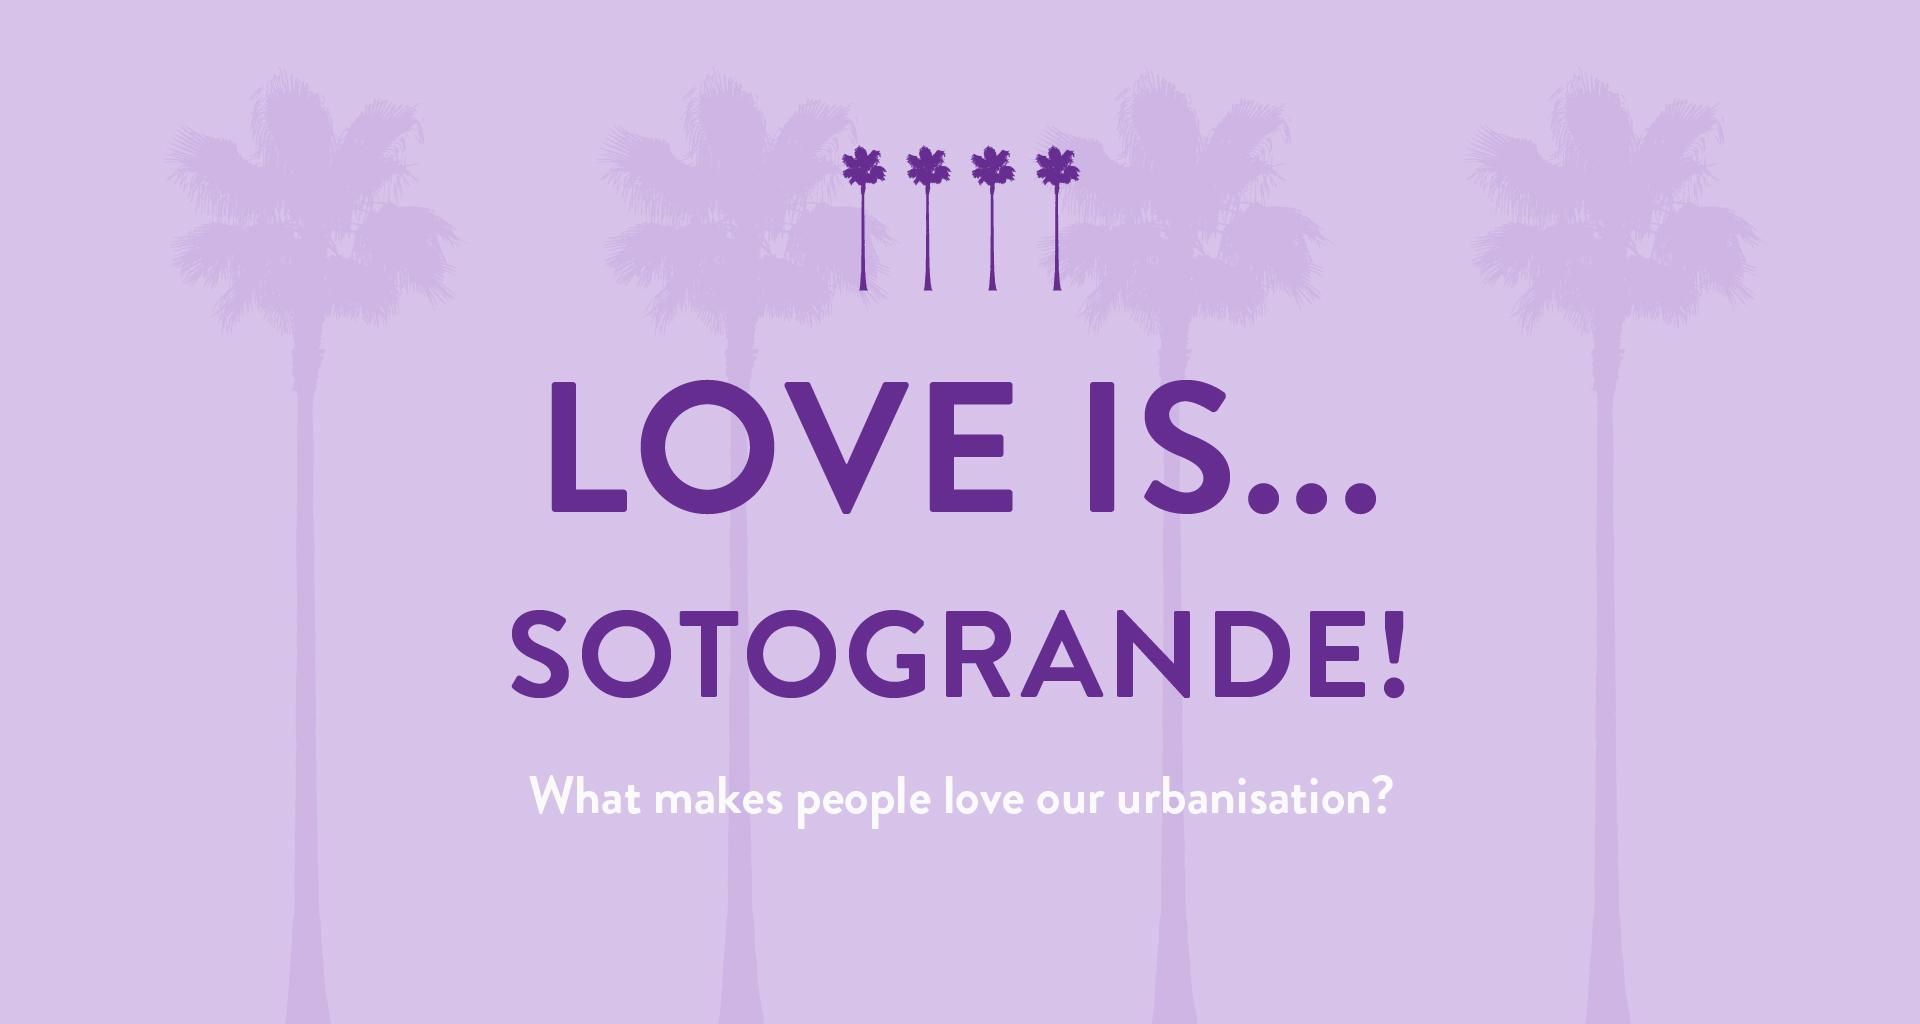 love-is-sotogrande-stephanie-noll-blog-2020_3